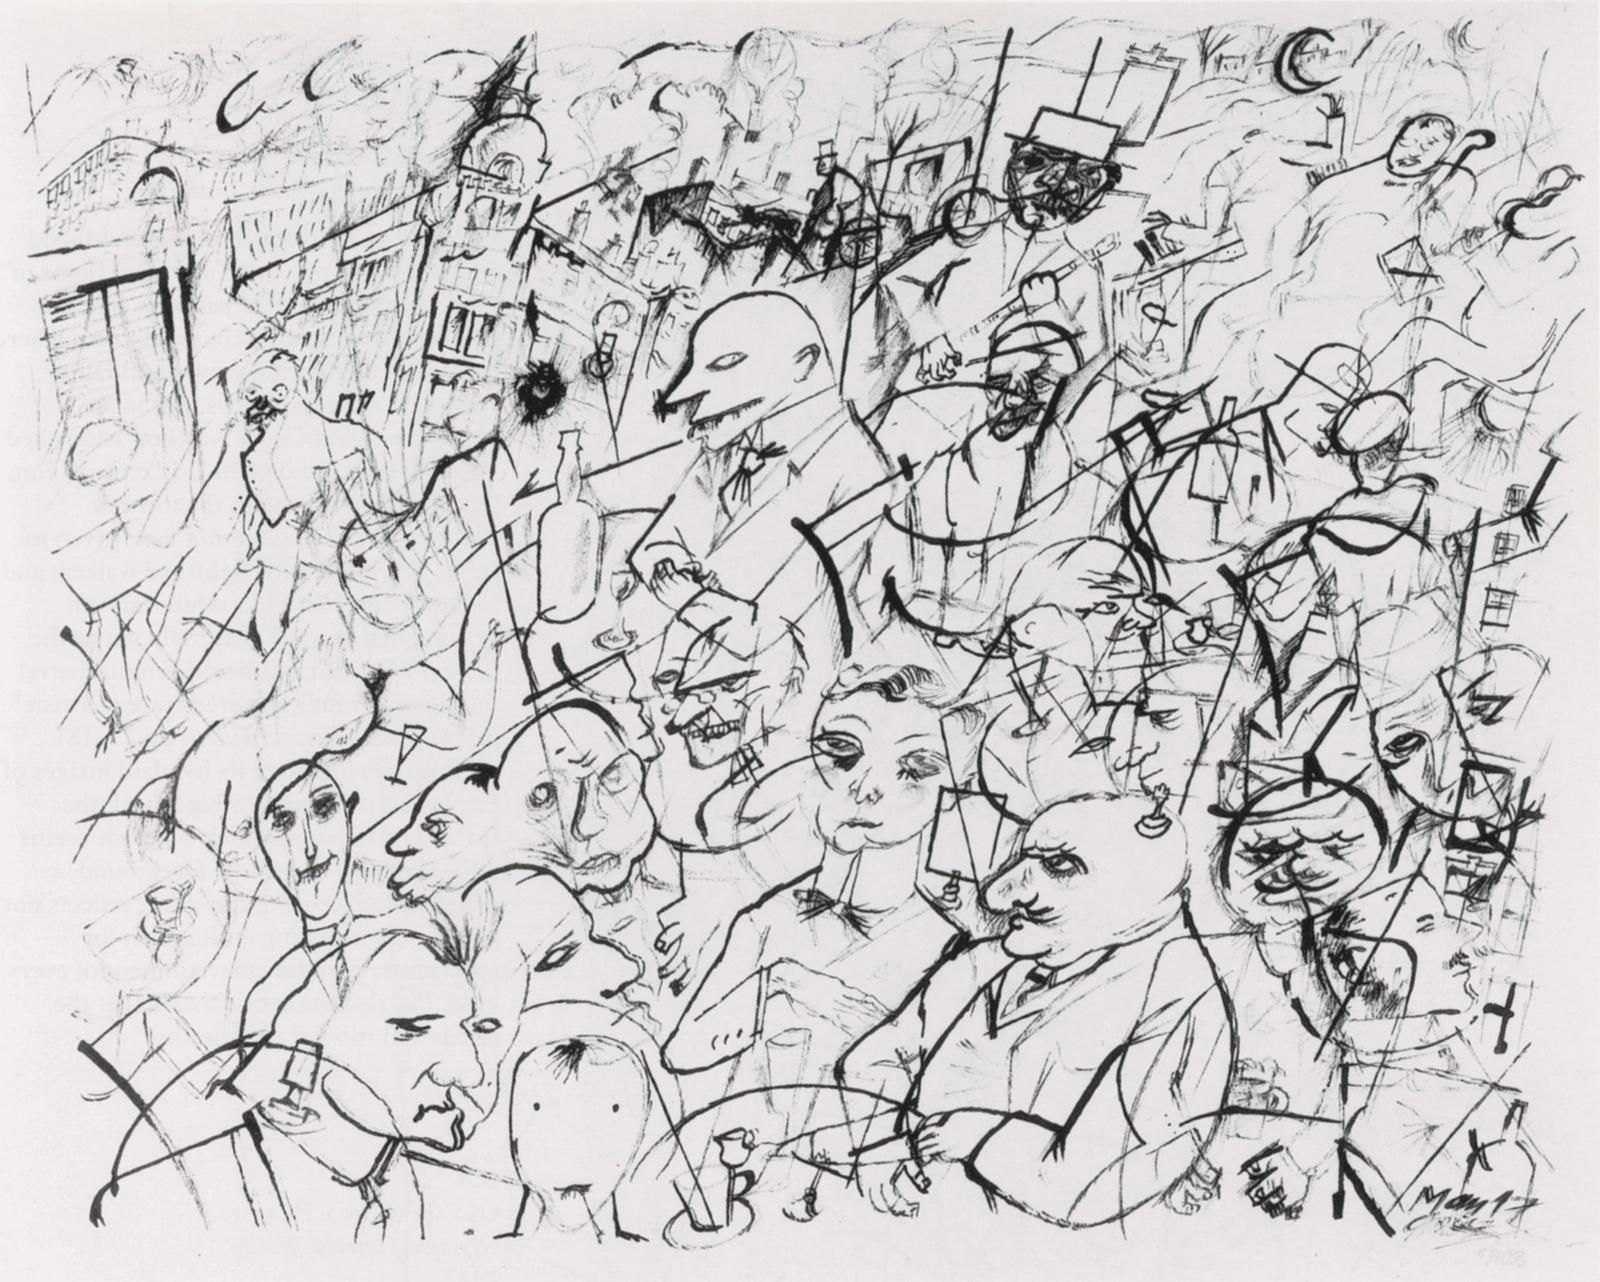 George Grosz: Streetcafé, 1917